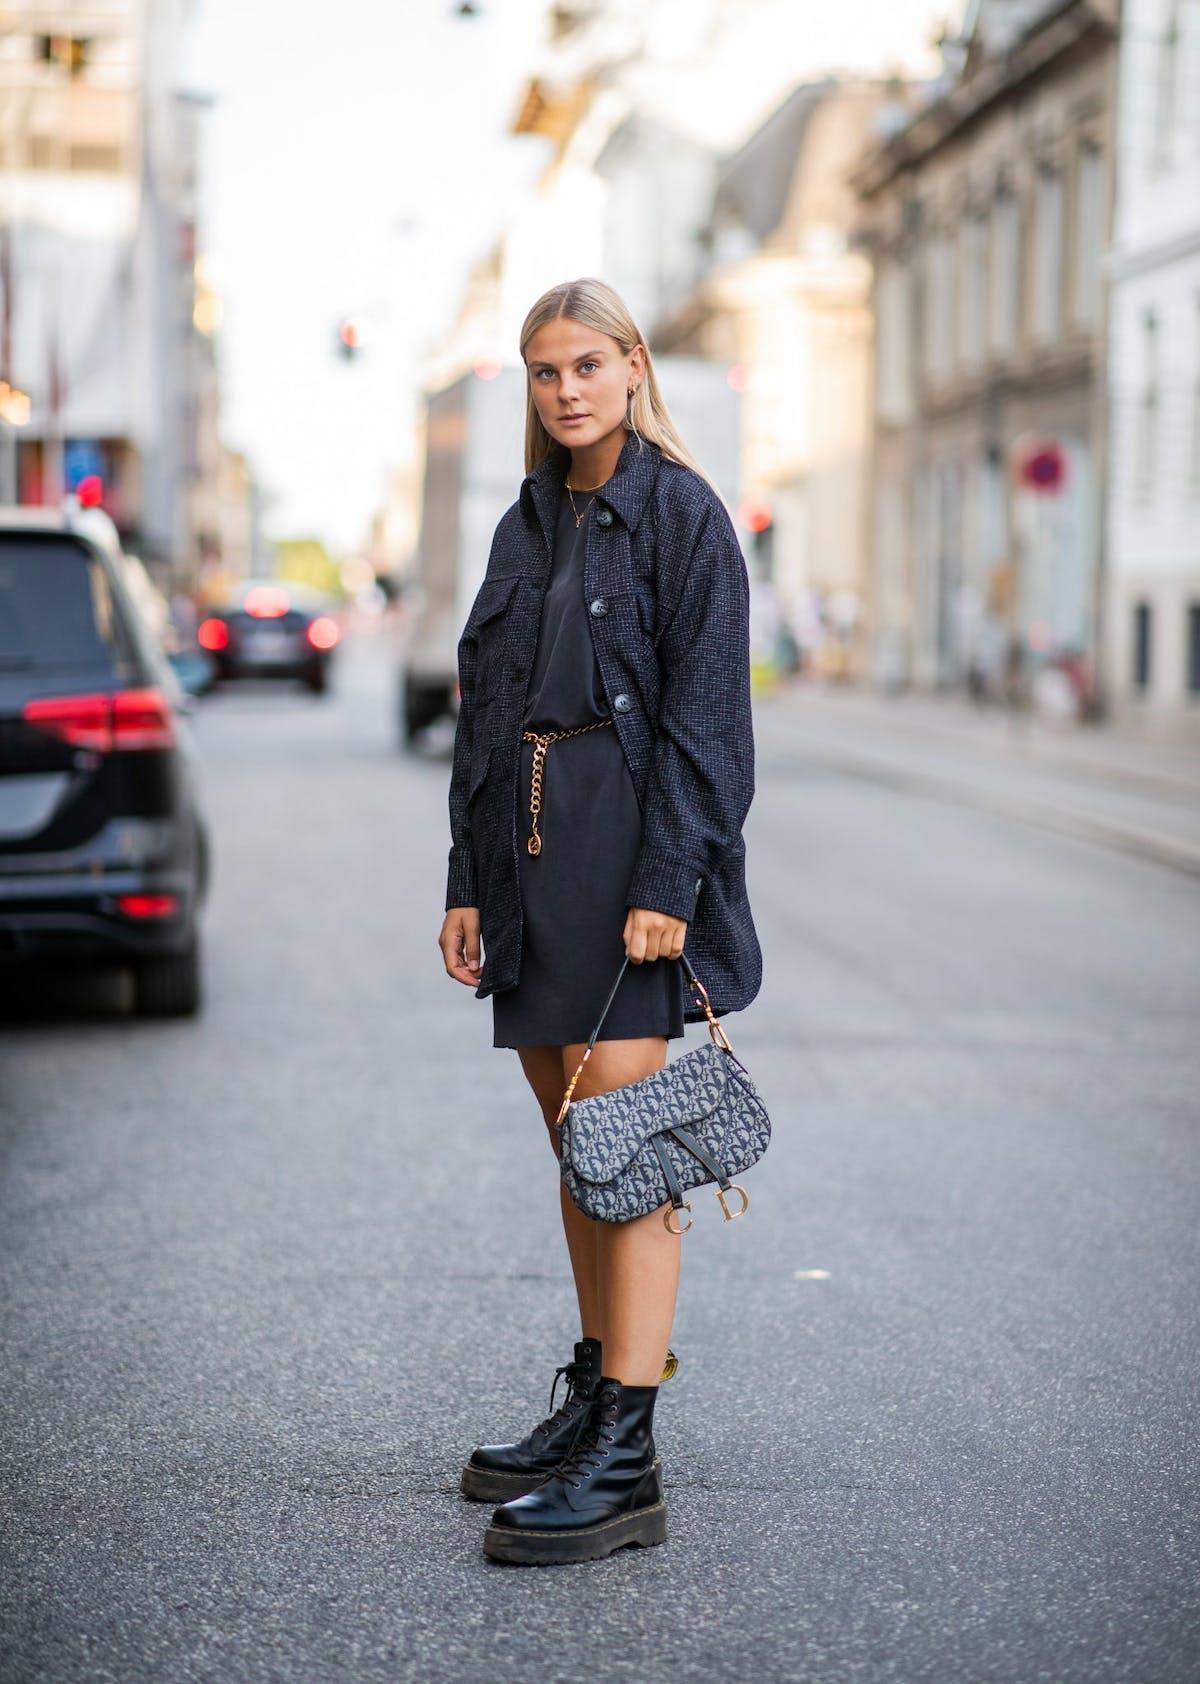 Fashion blogger Alessa Winter wearing Dr. Martens boots at Copenhagen  Fashion Week d97a2e9aaaad